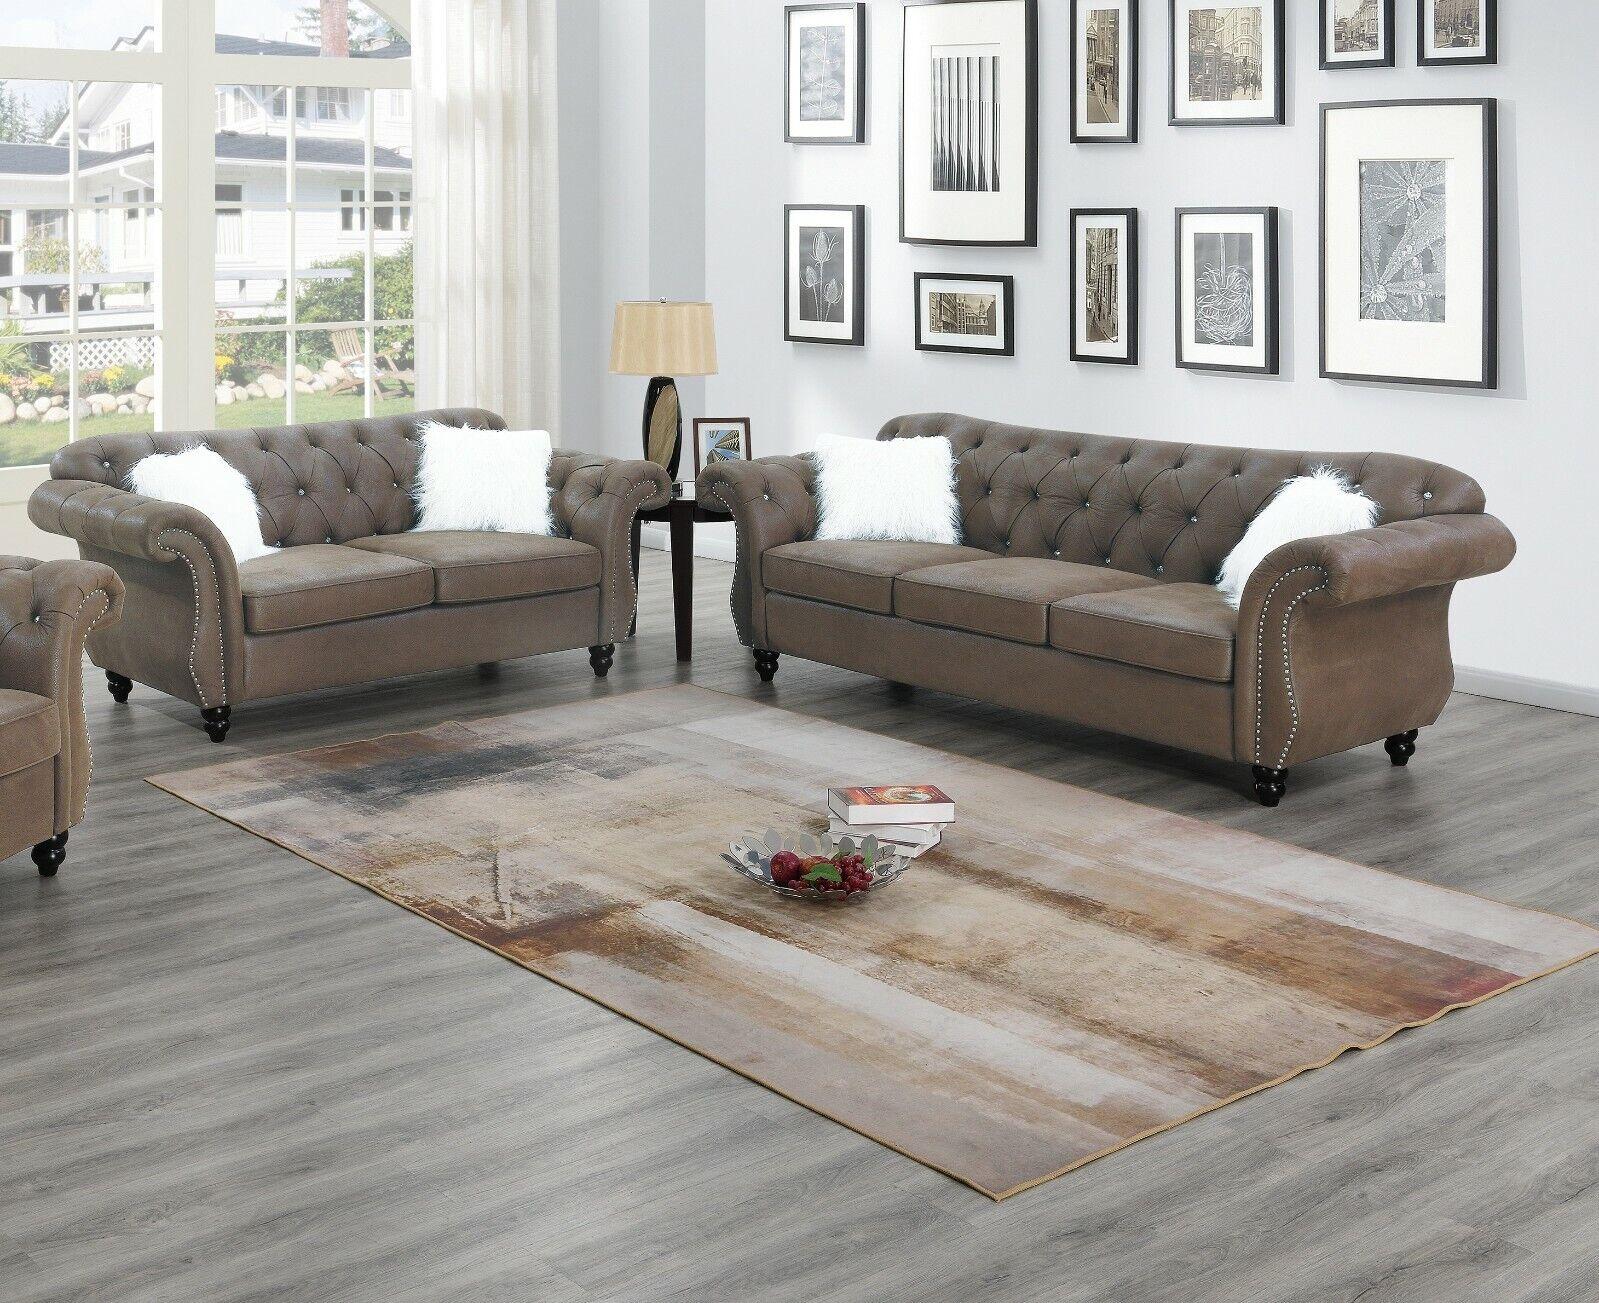 Living Room Furniture 2pc Sofa Set Dark Coffee Sofa Loveseat Chair Leatherette